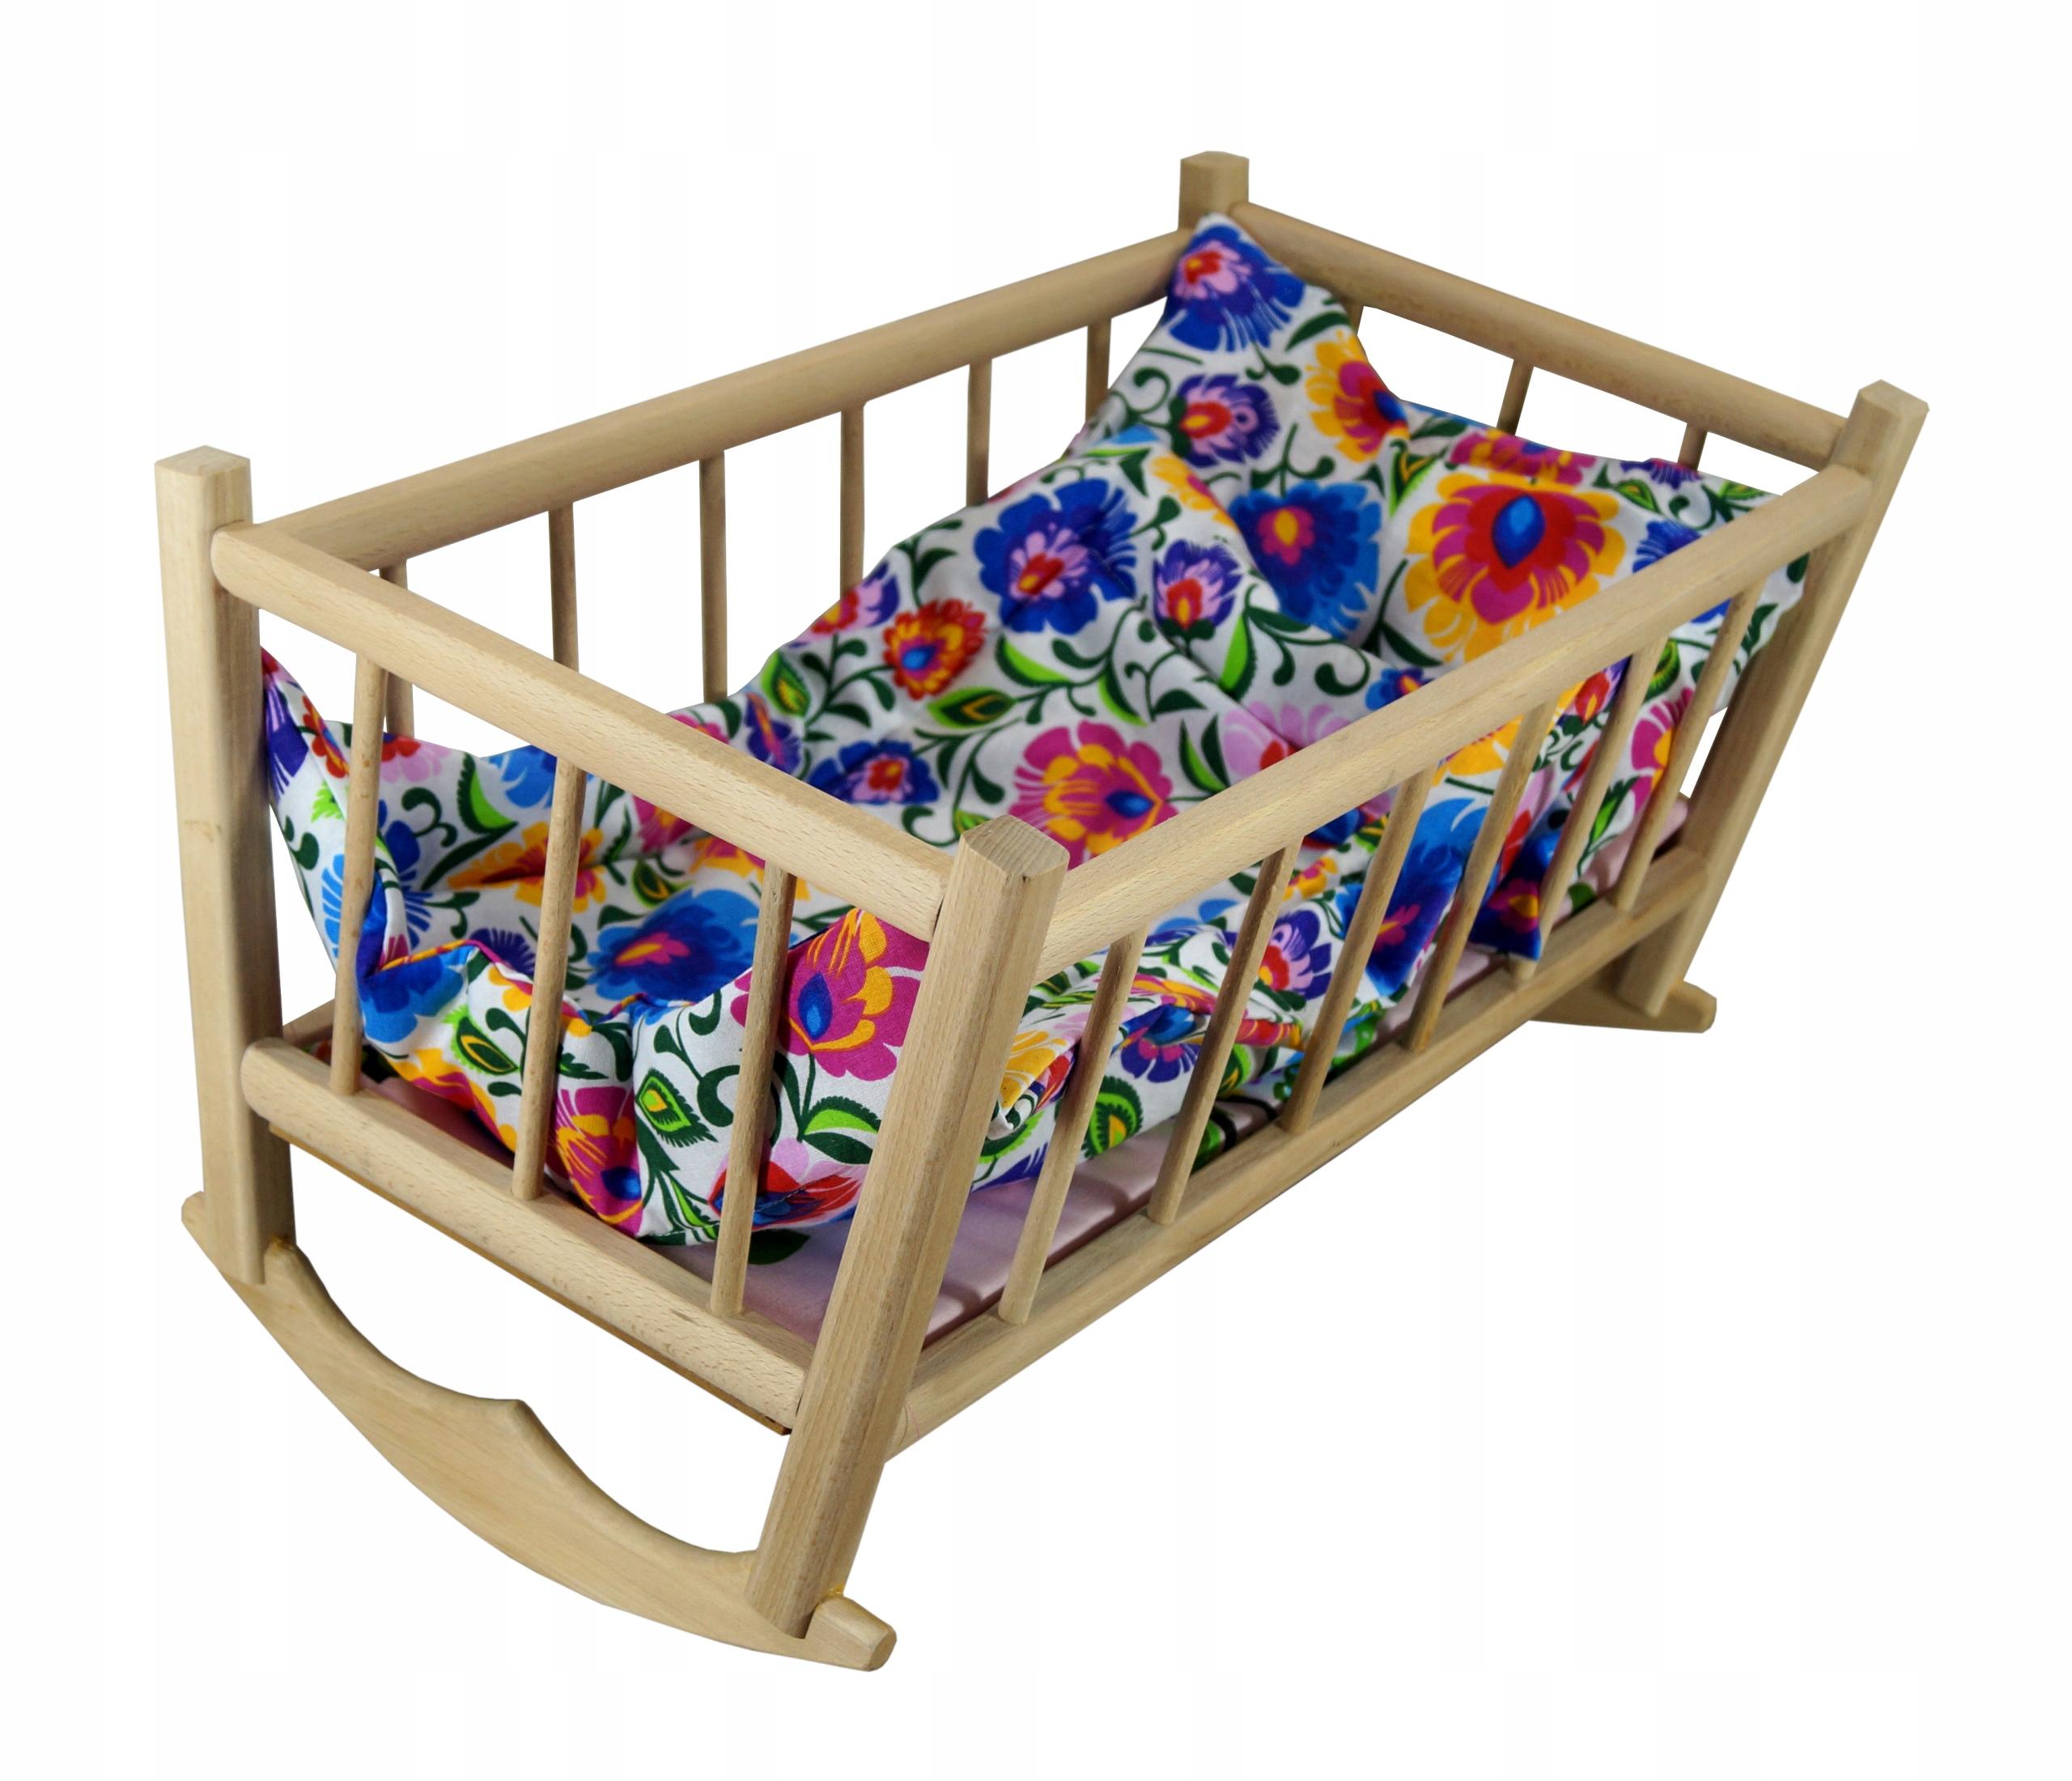 Drevené bábiky RETRO CRADLE z posteľnej bielizne Łowicz